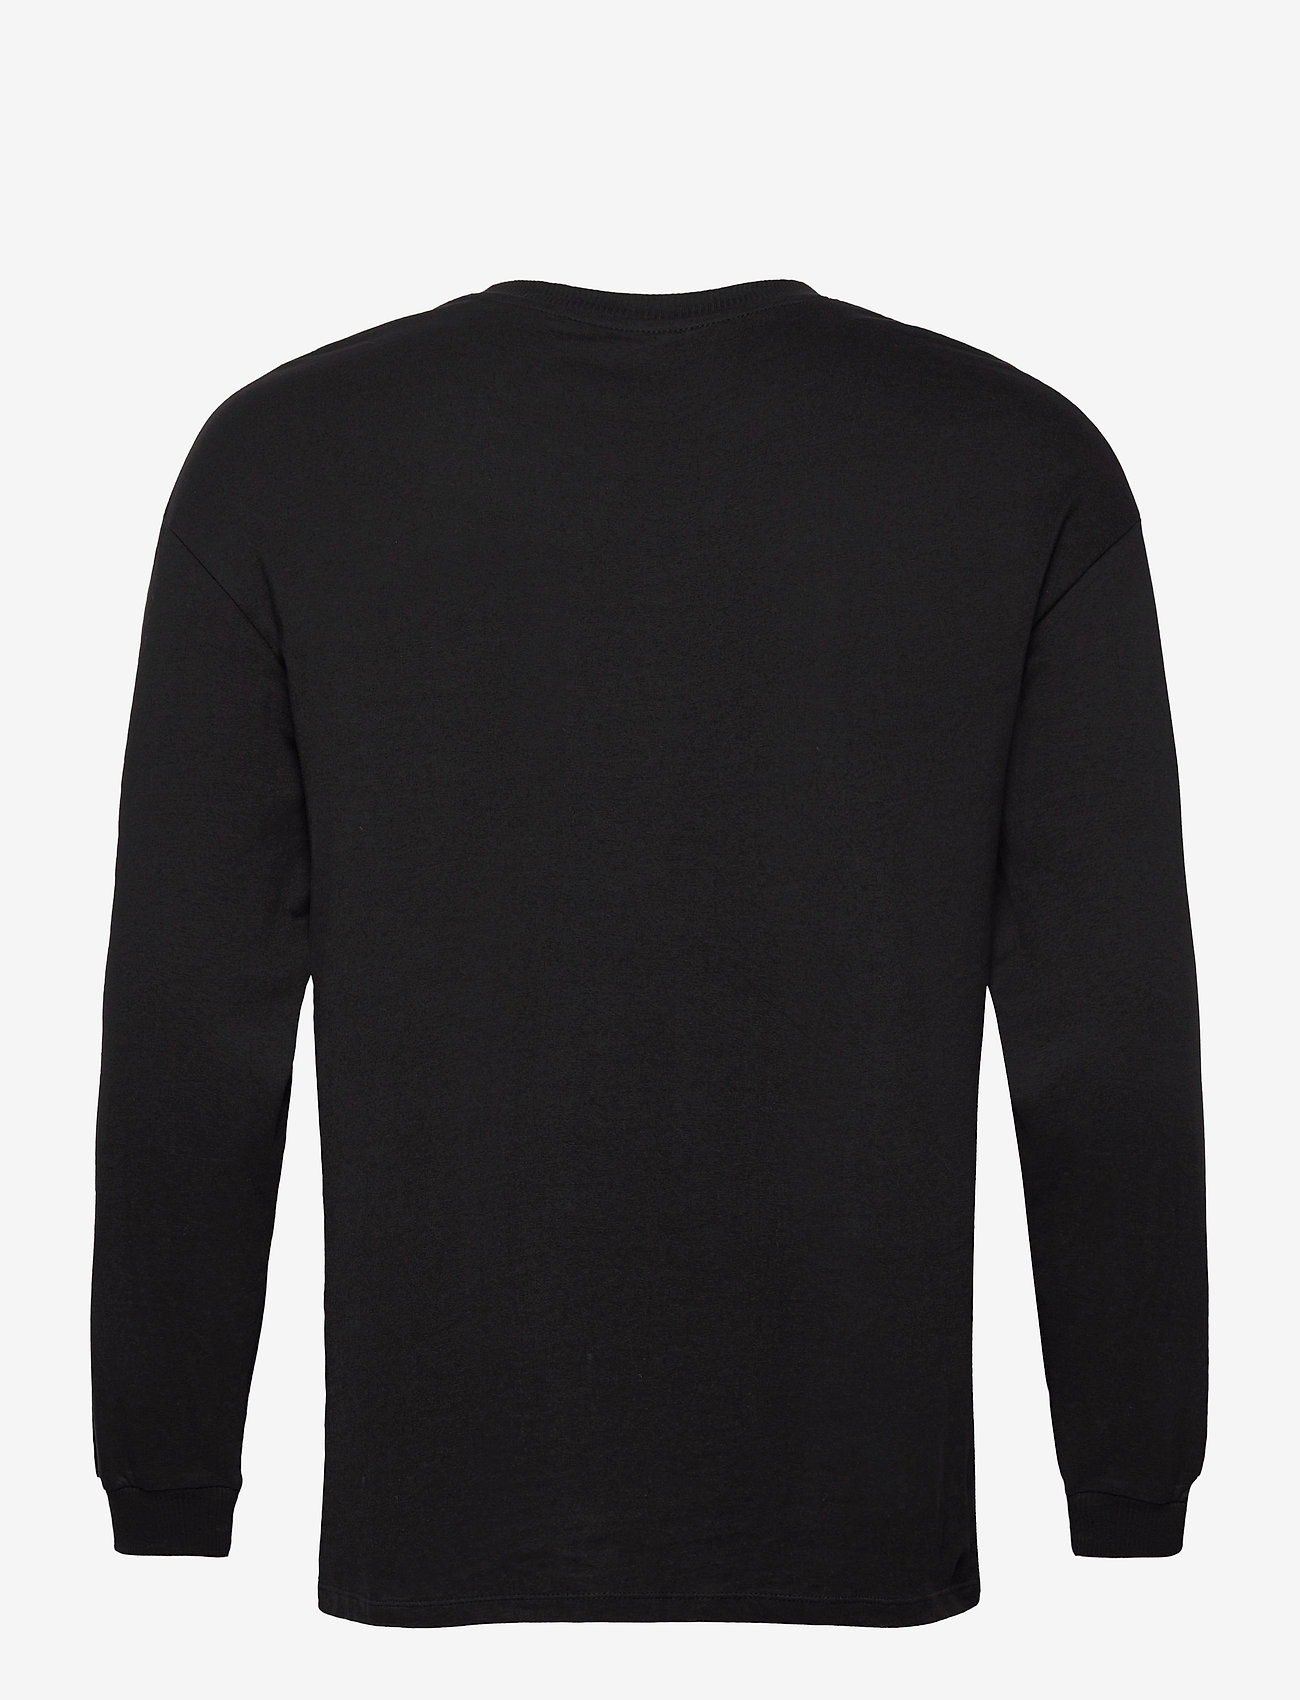 Jack & Jones - JORBRINK TEE LS CREW NECK - basic t-shirts - black - 1